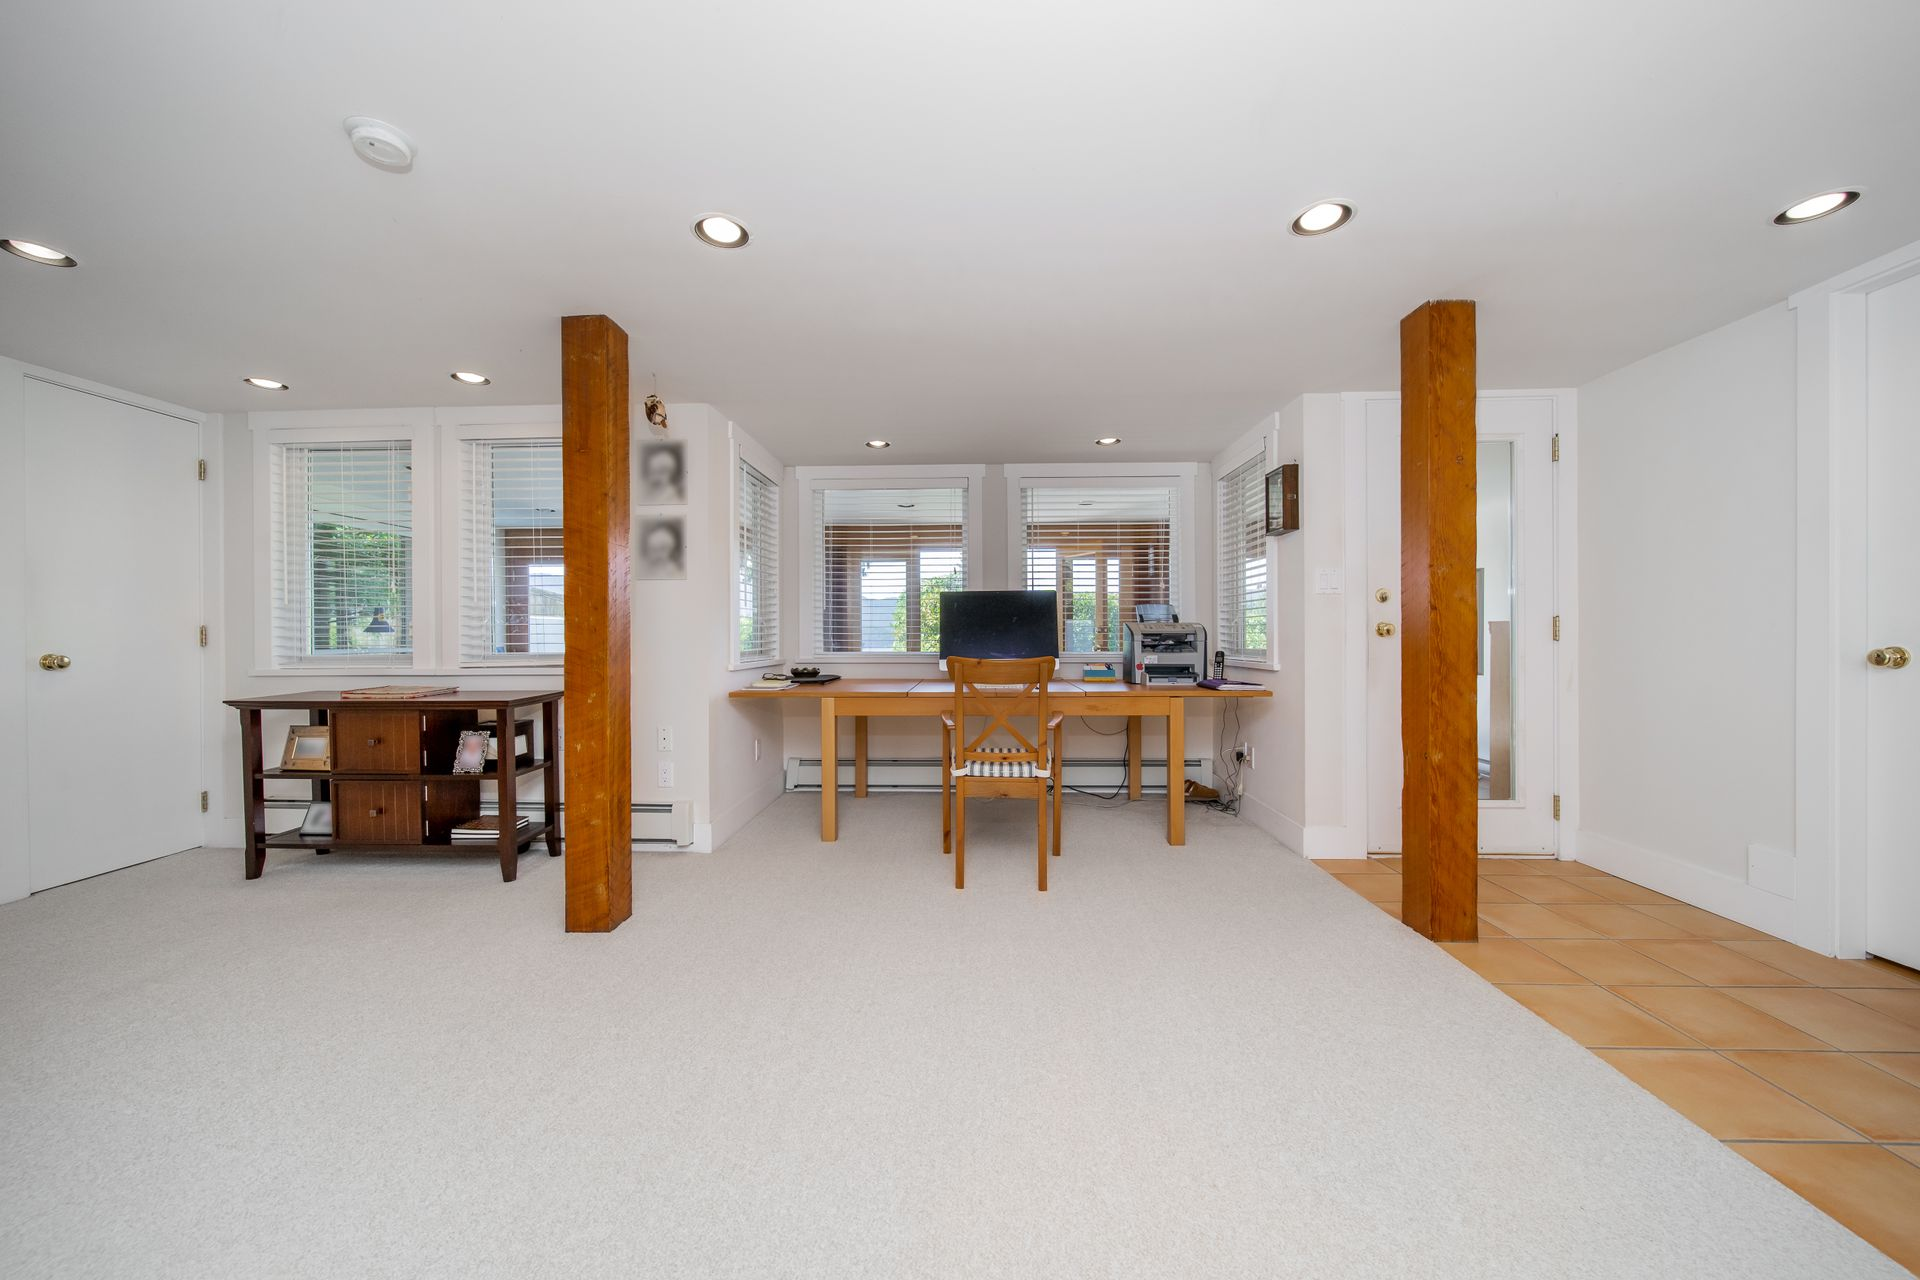 6245-nelson-avenue-west-vancouver-26 at 6245 Nelson Avenue, Gleneagles, West Vancouver